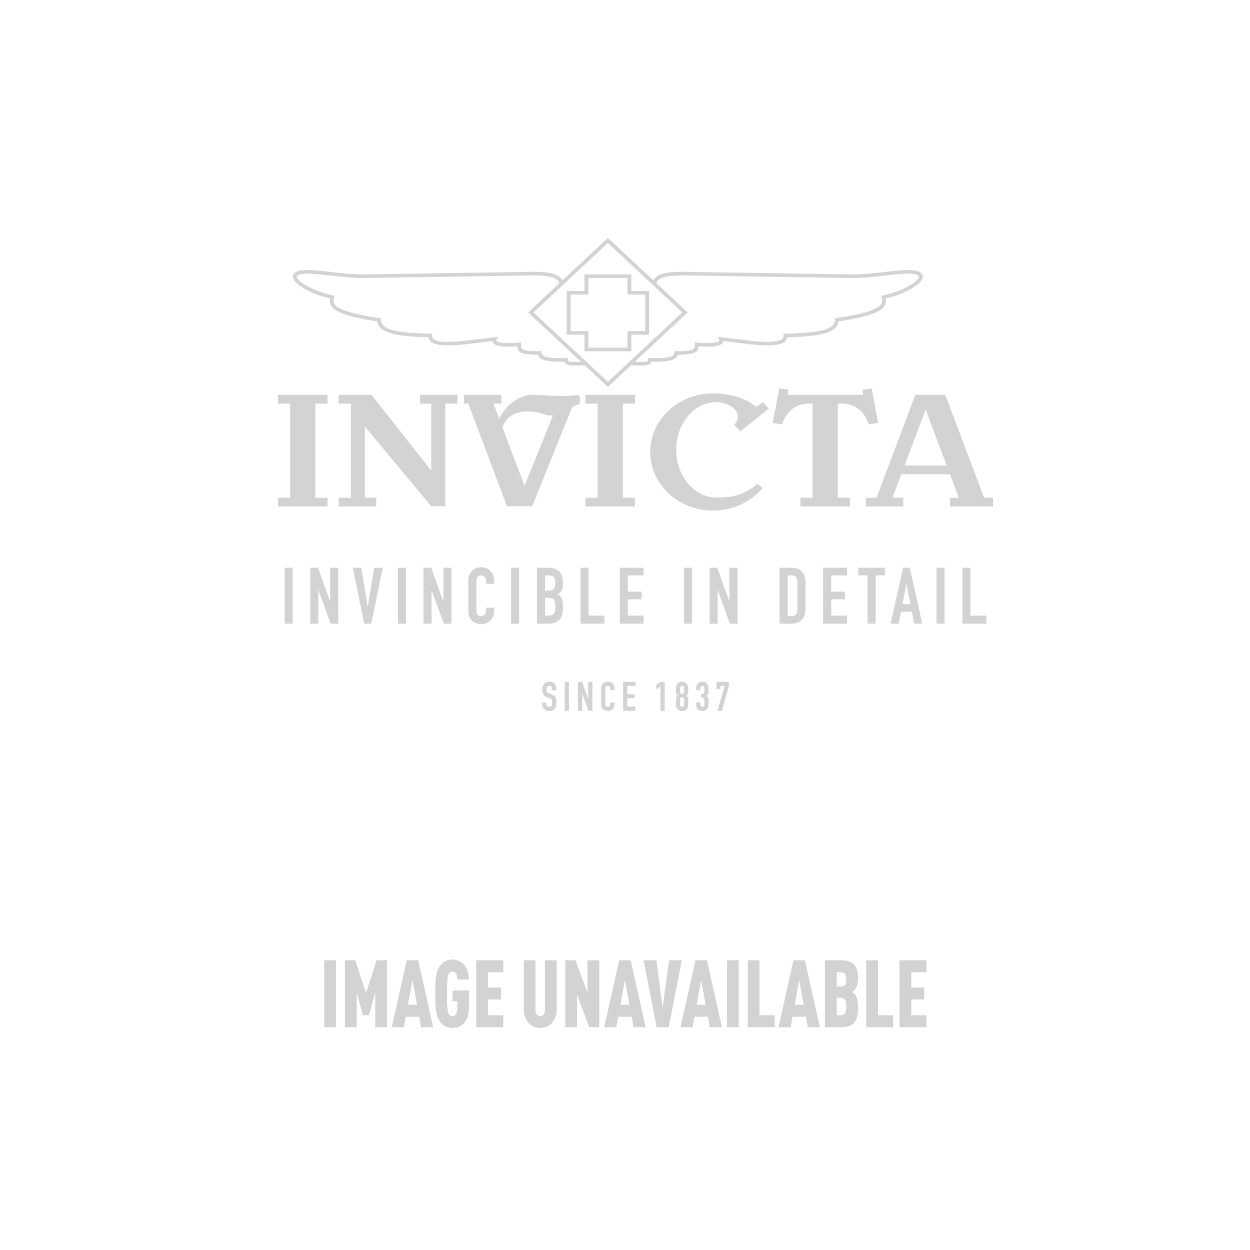 Invicta Sea Base Swiss Movement Quartz Watch - Gold case with Black tone Polyurethane band - Model 20179